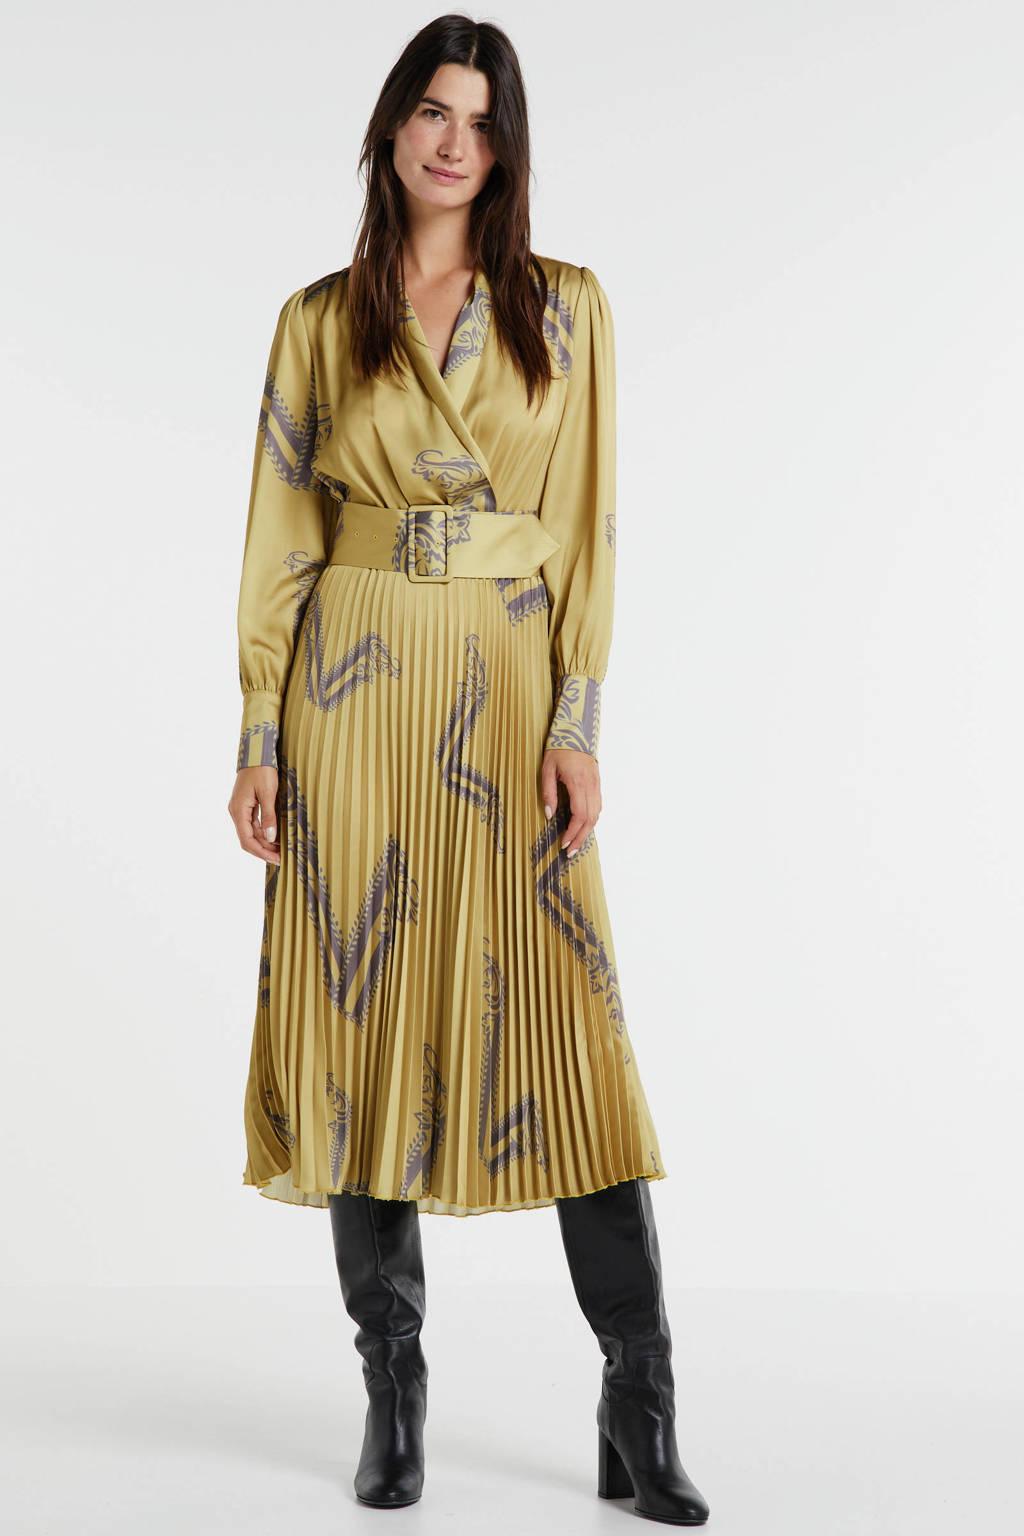 JOSH V maxi jurk Reneta met all over print en ceintuur okergeel/taupe, Okergeel/taupe